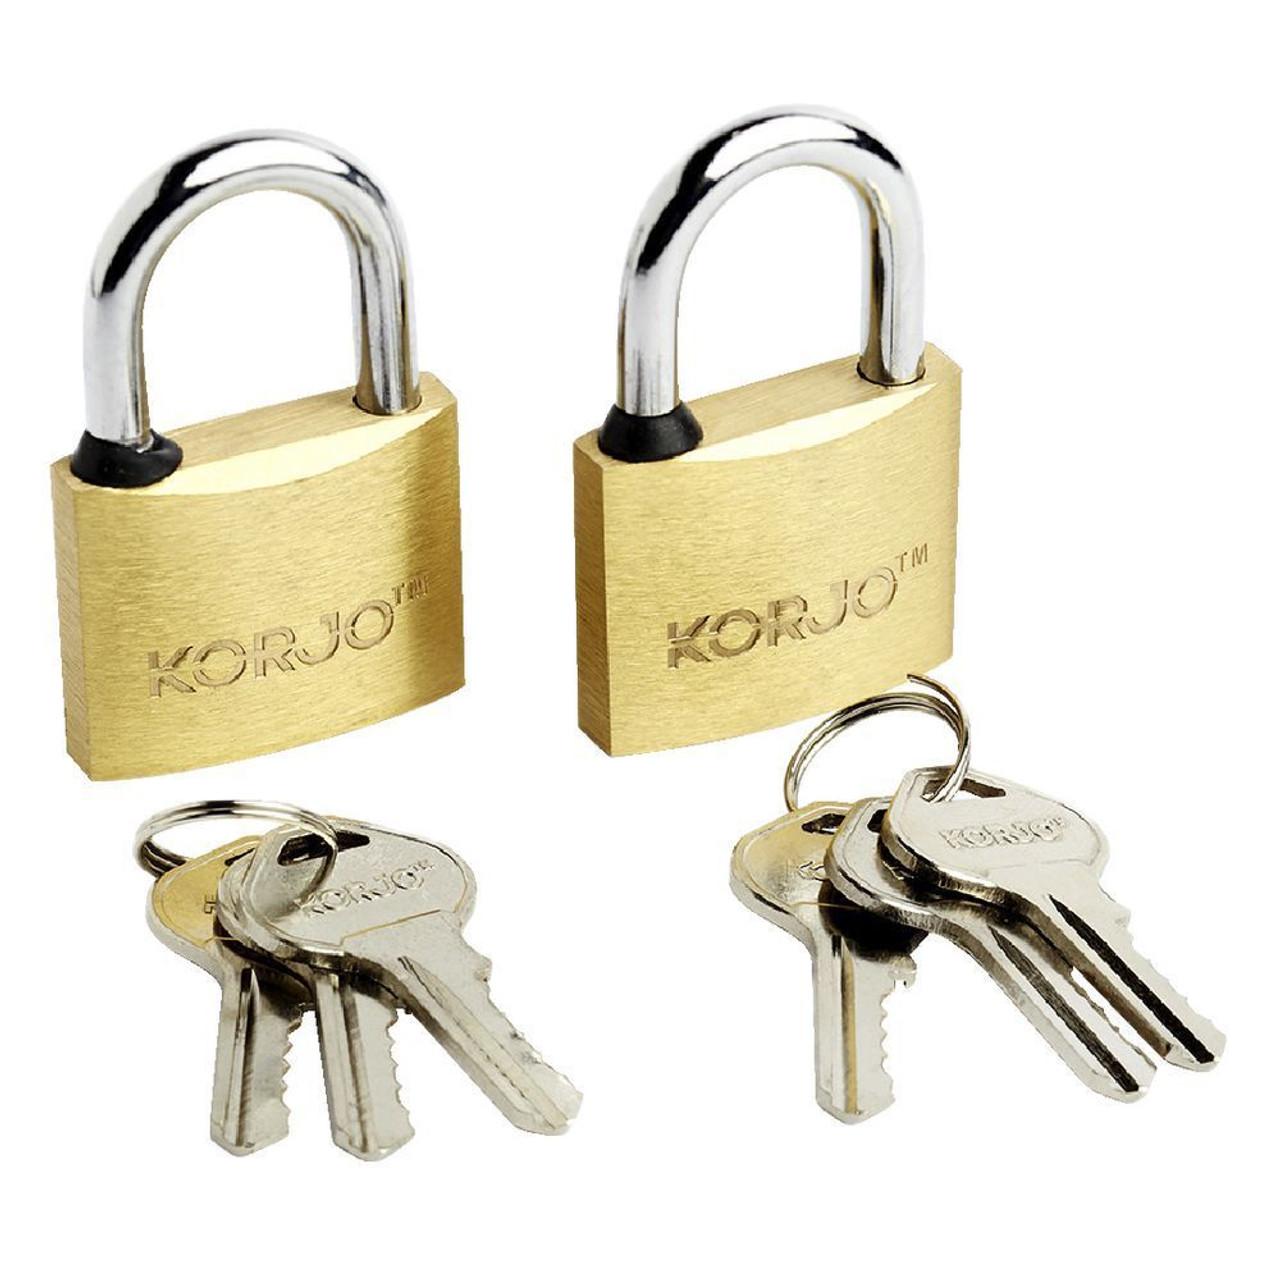 Korjo L40D Rust Proof Solid Brass Body Locks 40mm 2 Pack